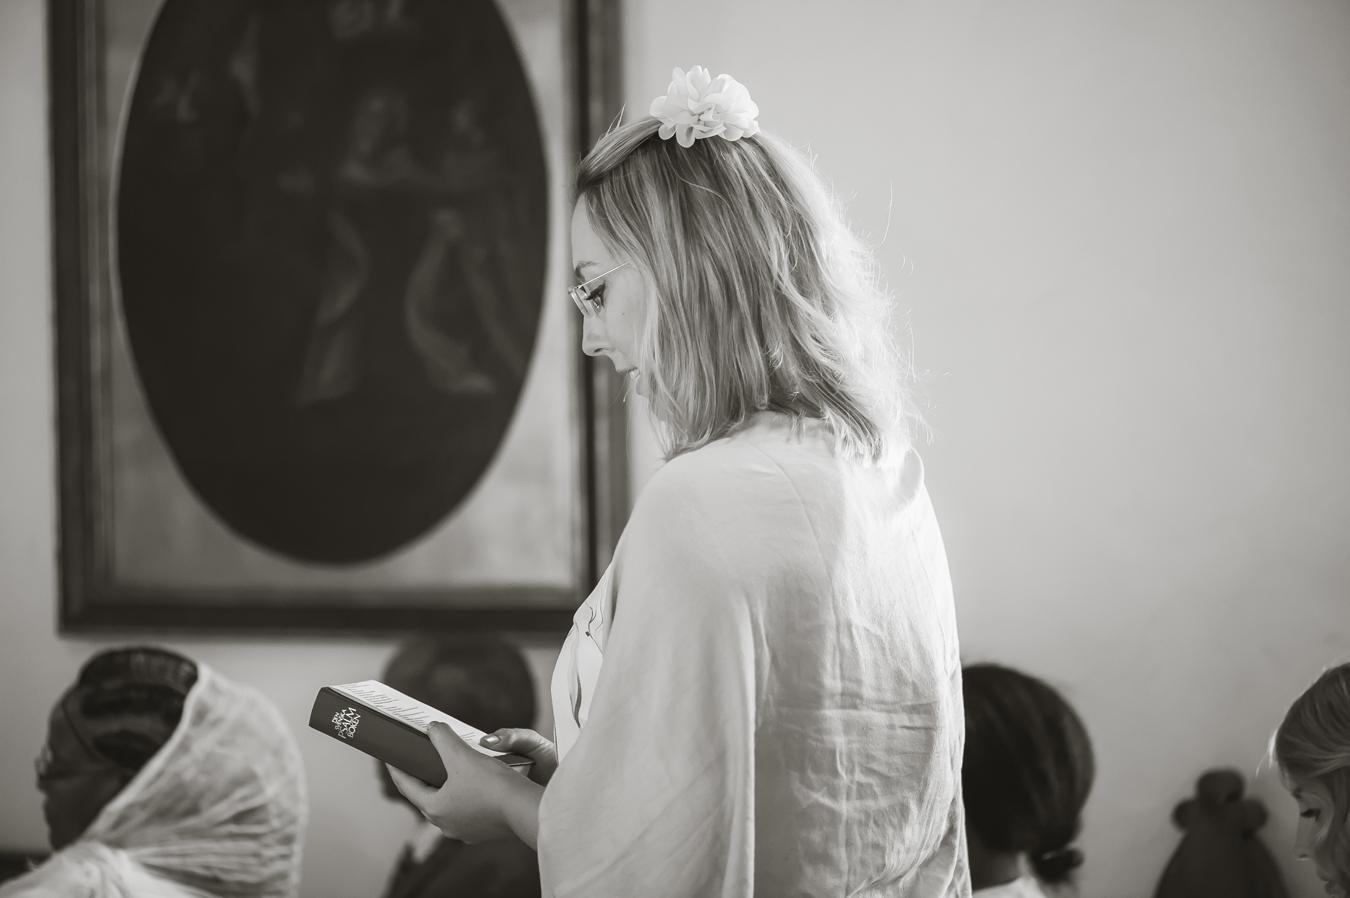 025-bröllop-gotland-fridhem-neas-fotografi.jpg